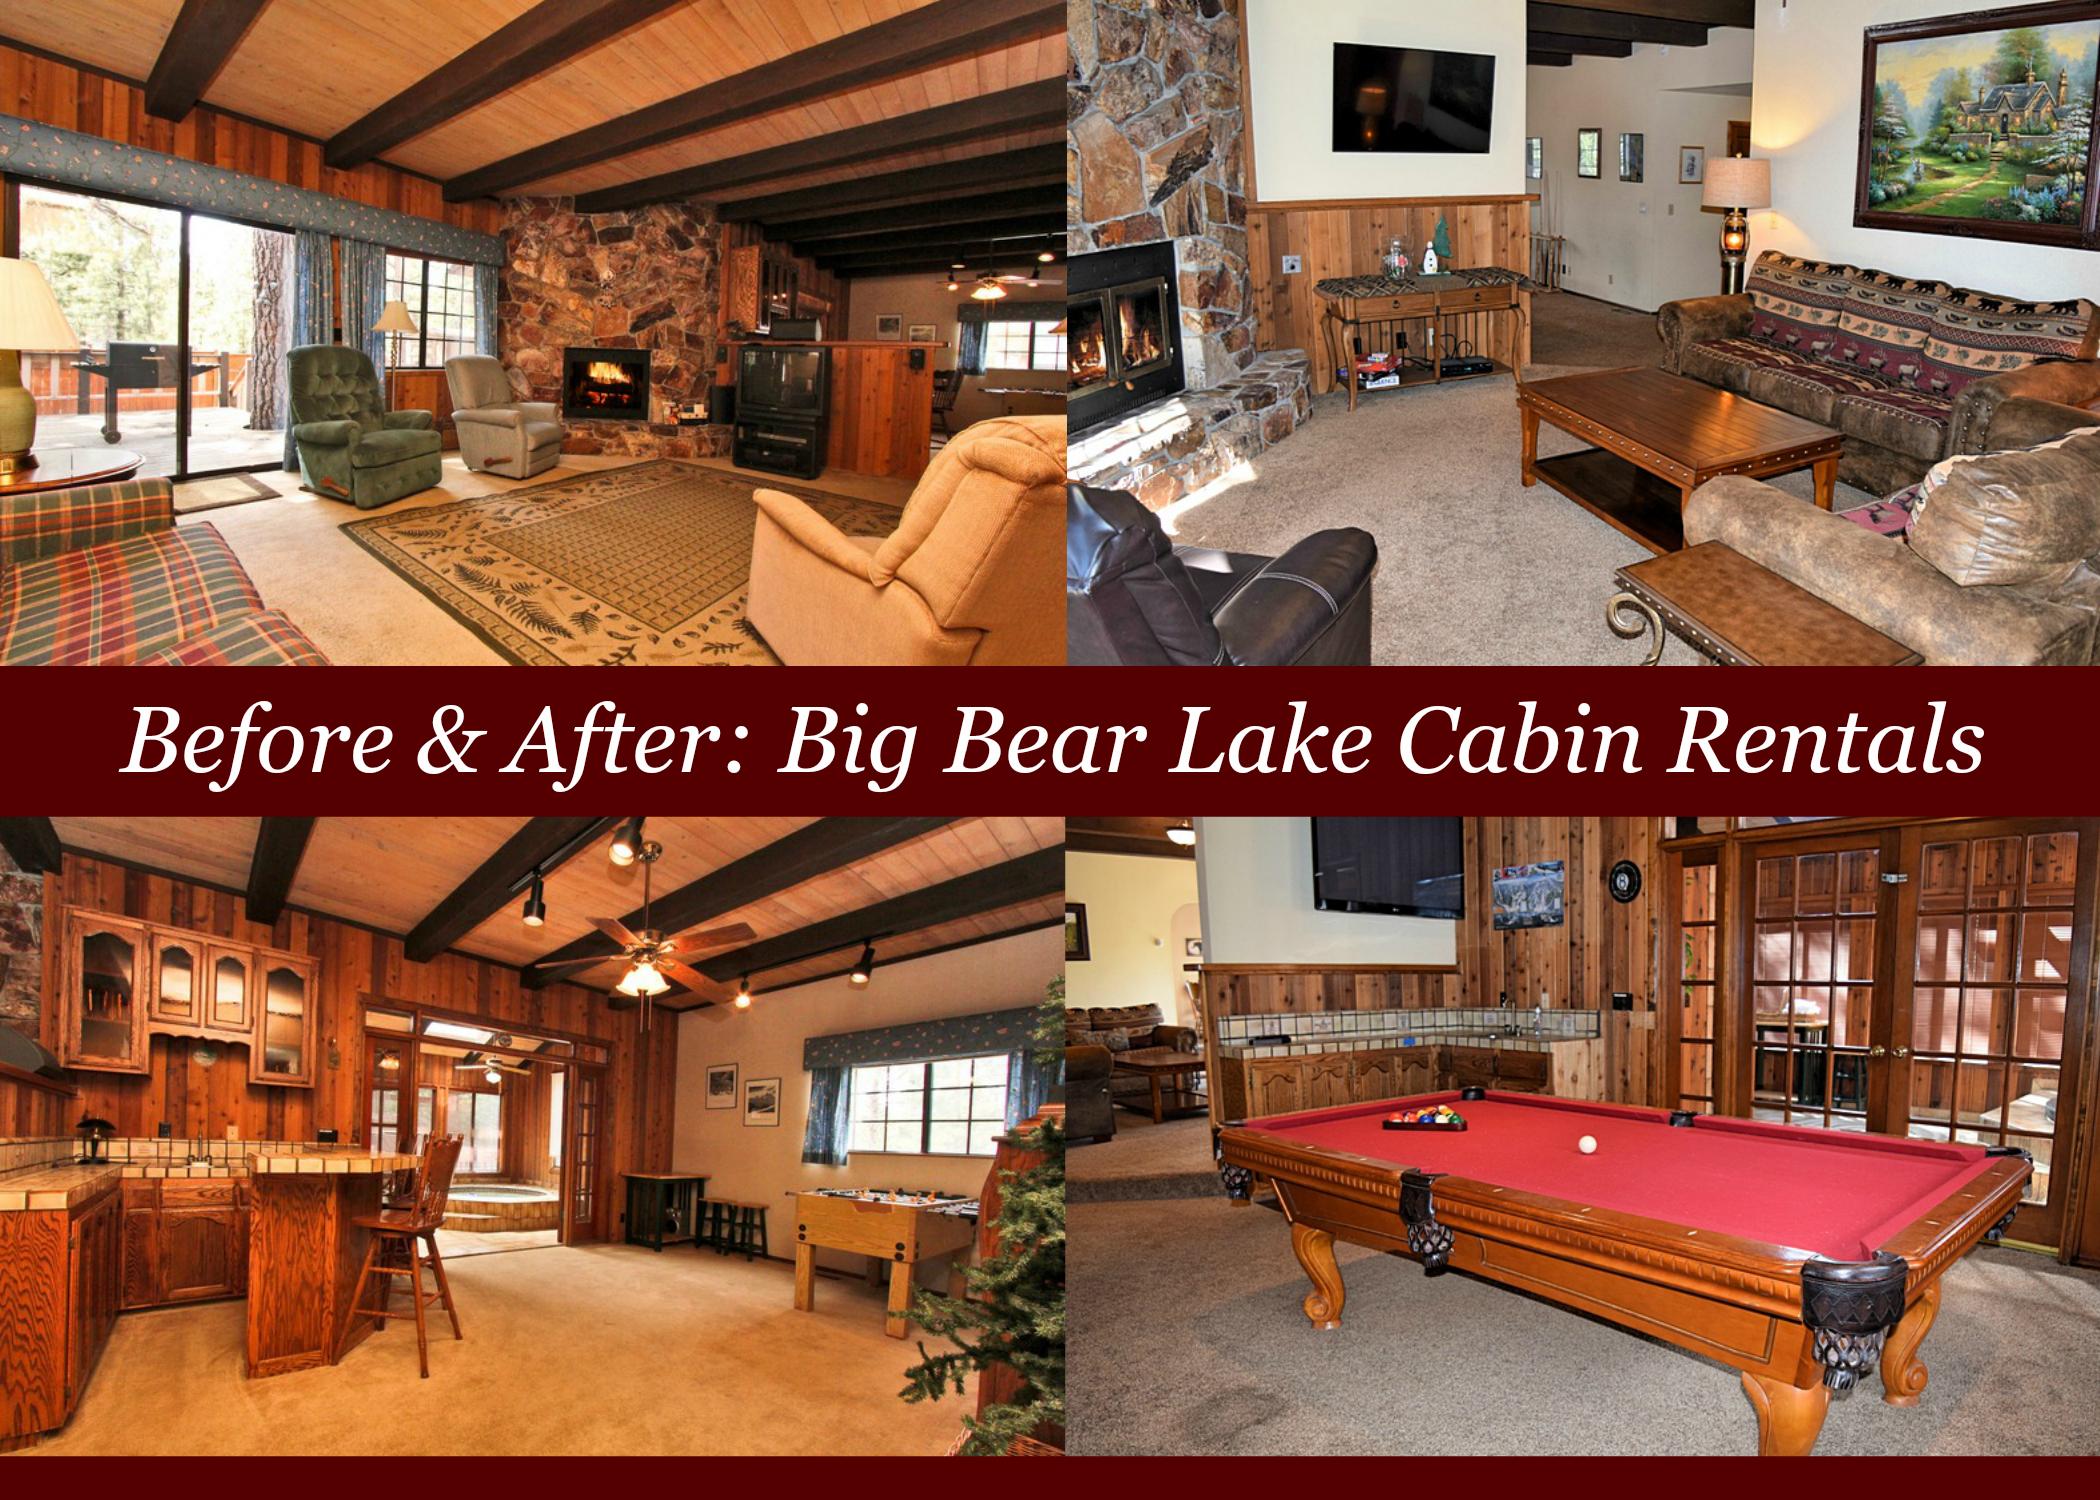 Big bear lake vacation rental updates destination big bear for Big bear lakefront cabin rentals